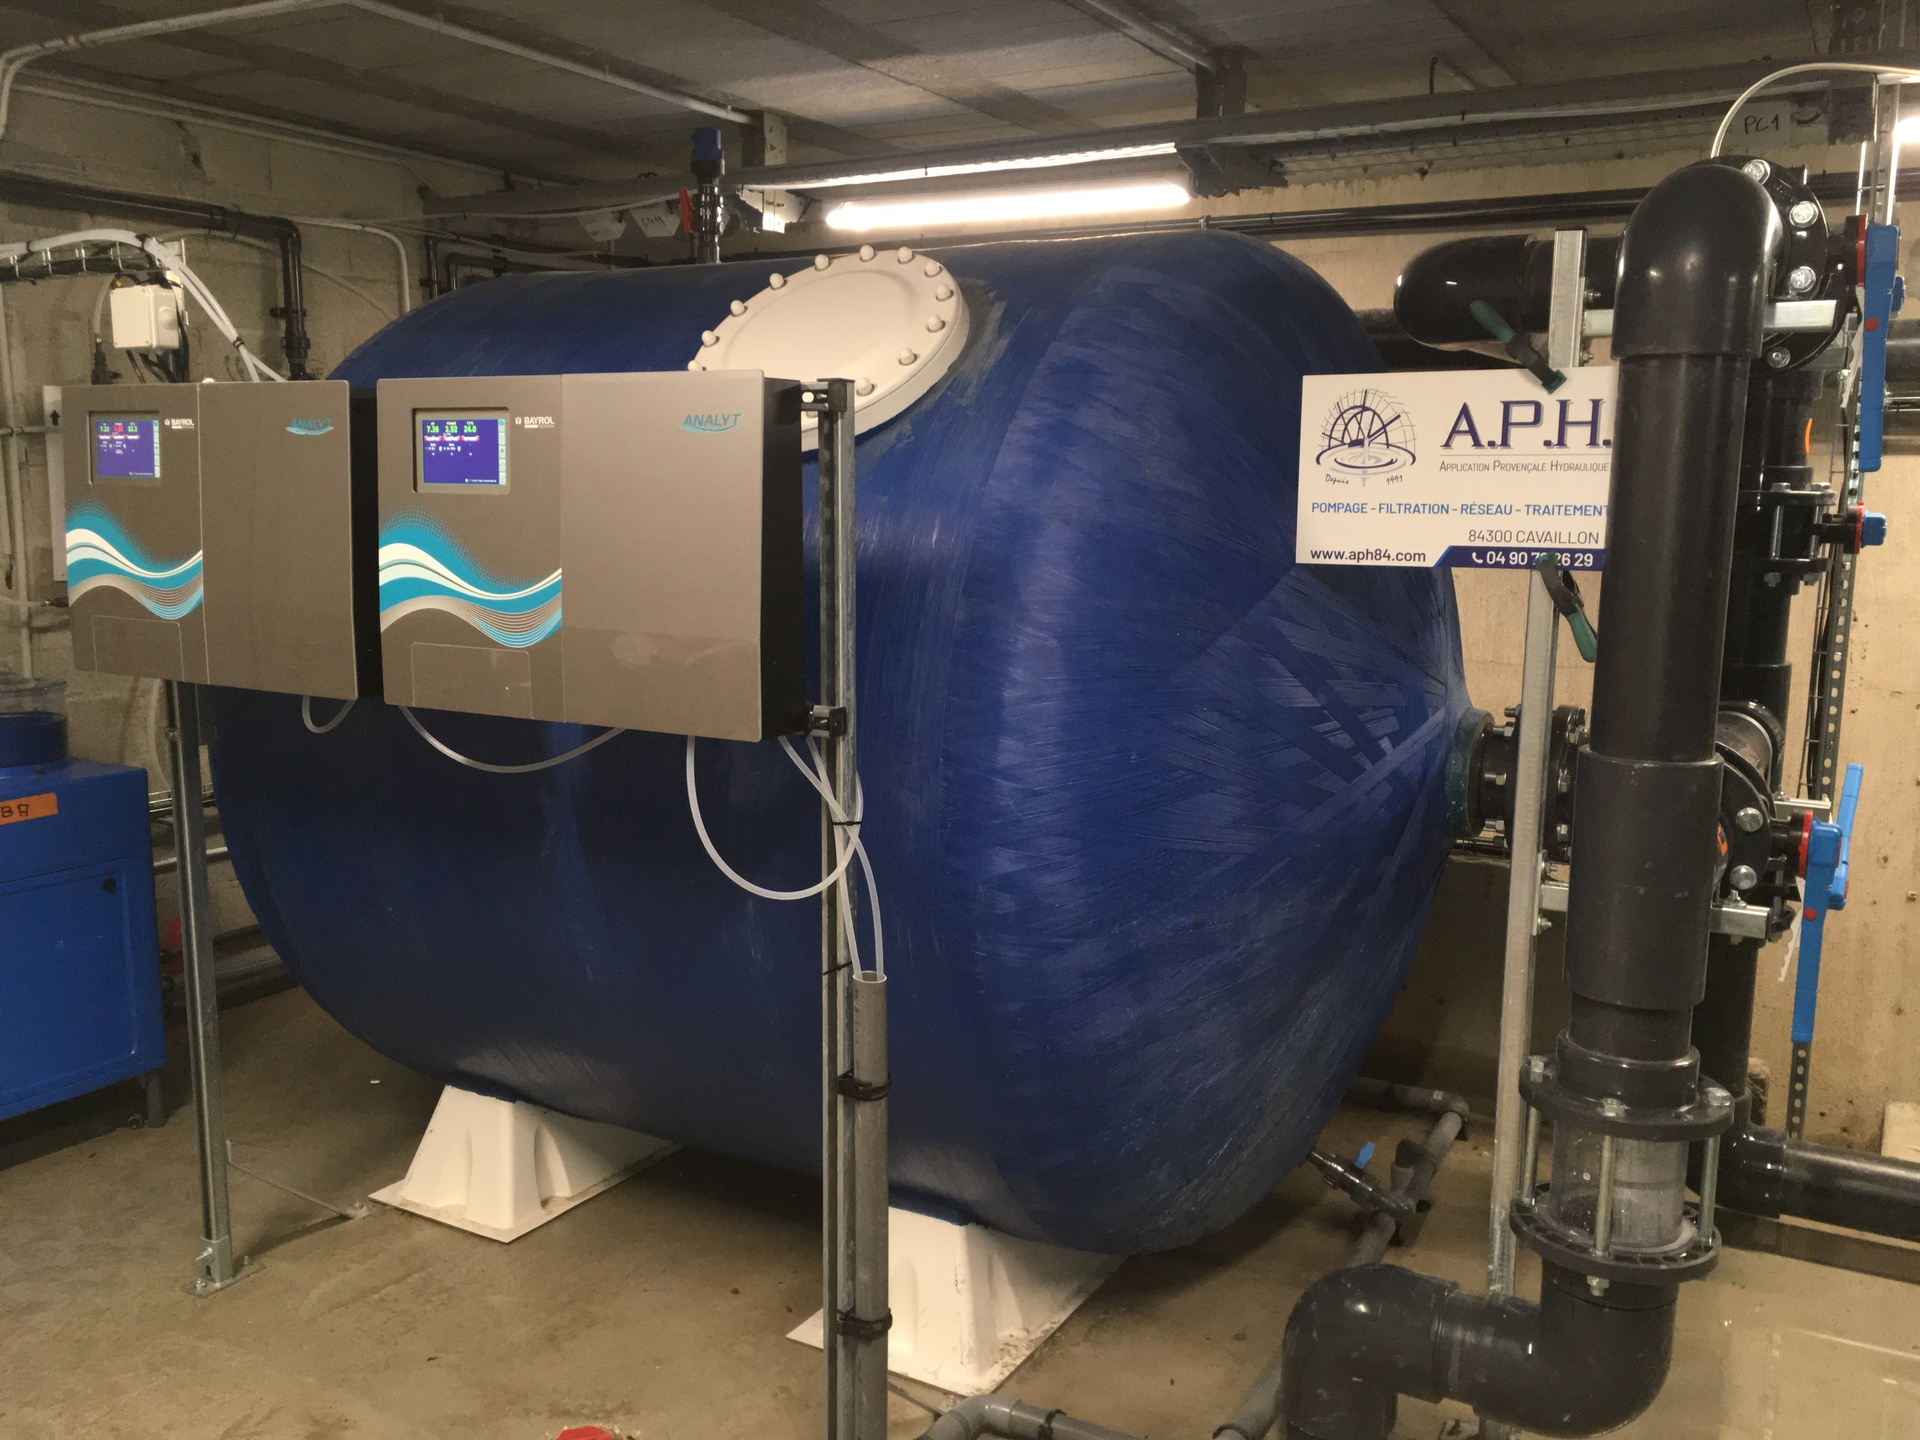 cavaillon roudiere systeme de filtration